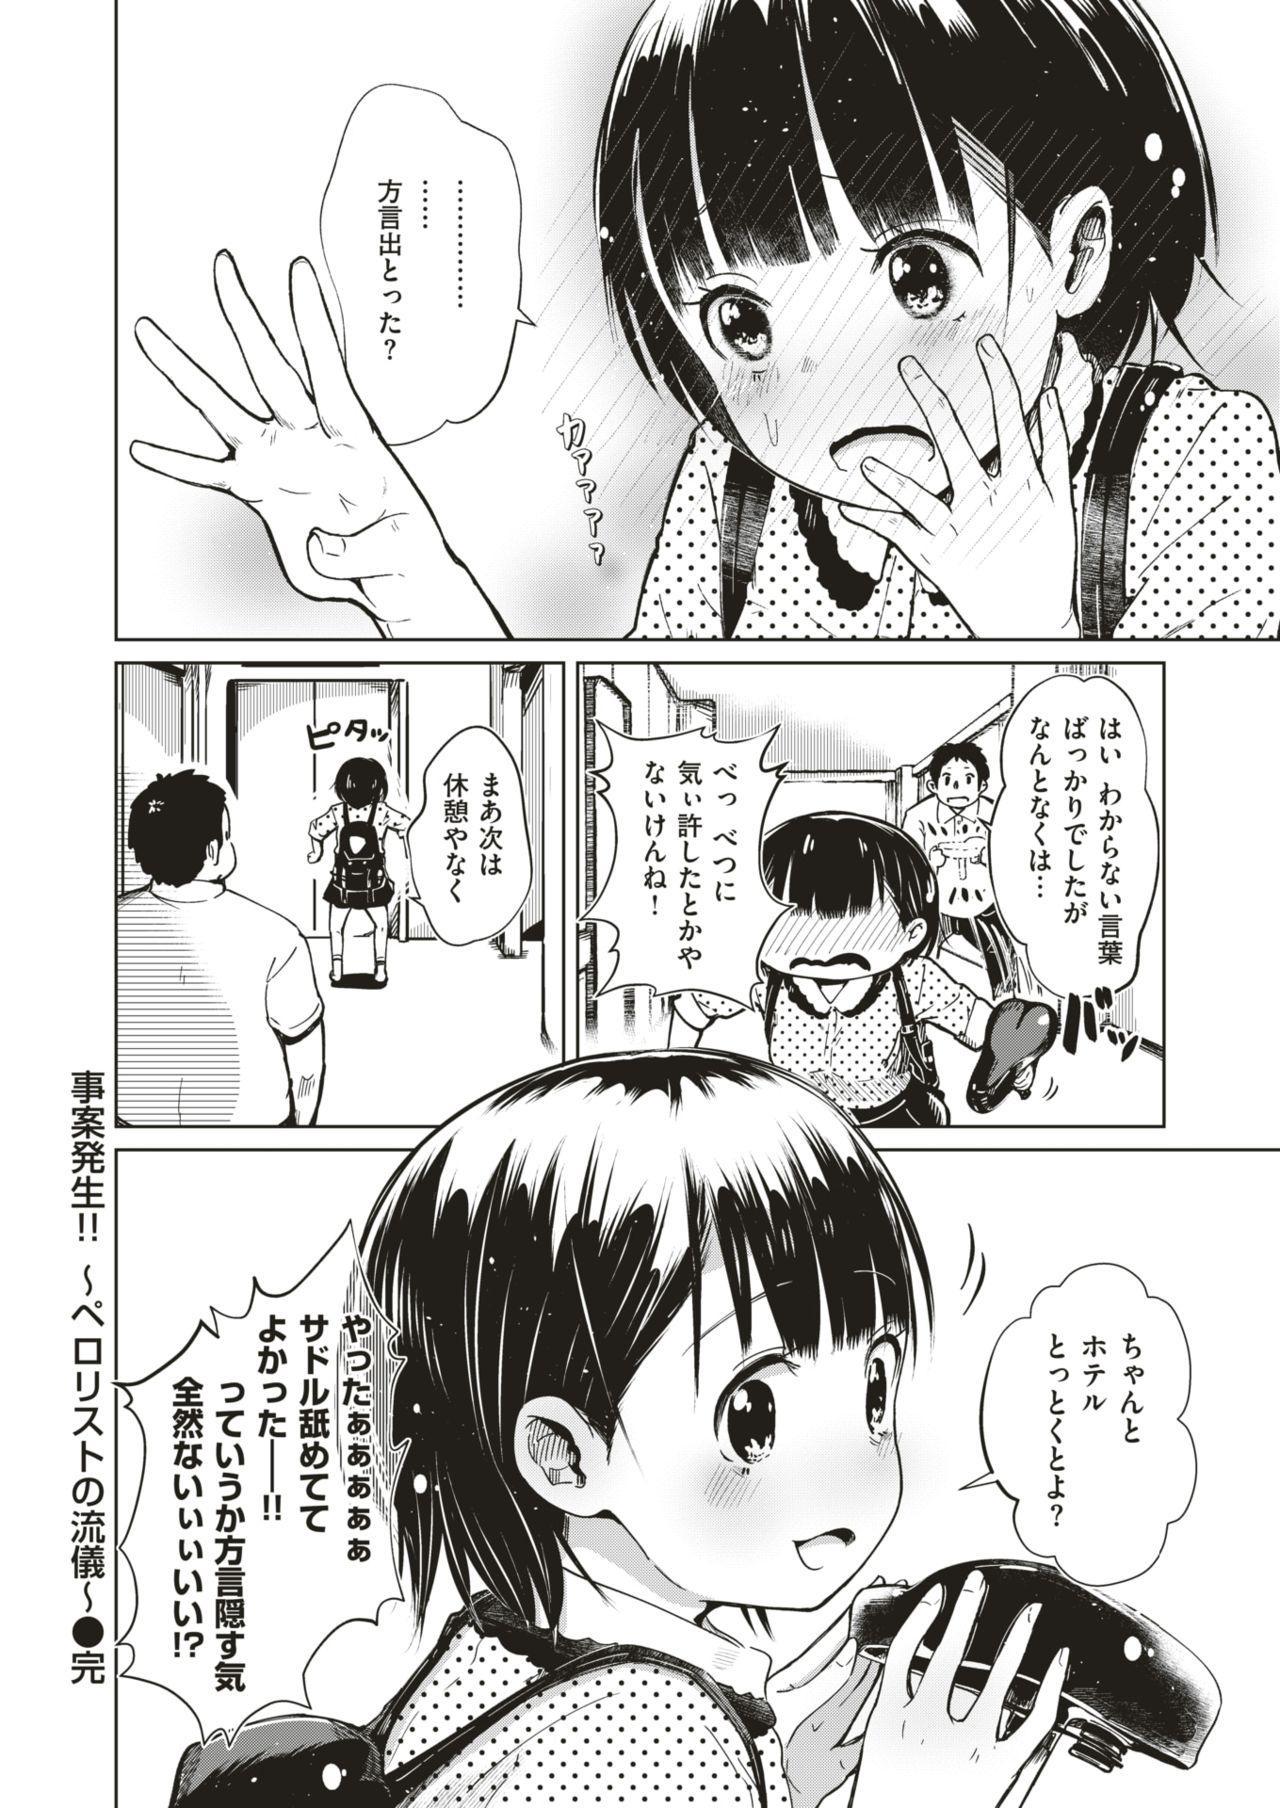 COMIC HAPPINING Vol. 4 126